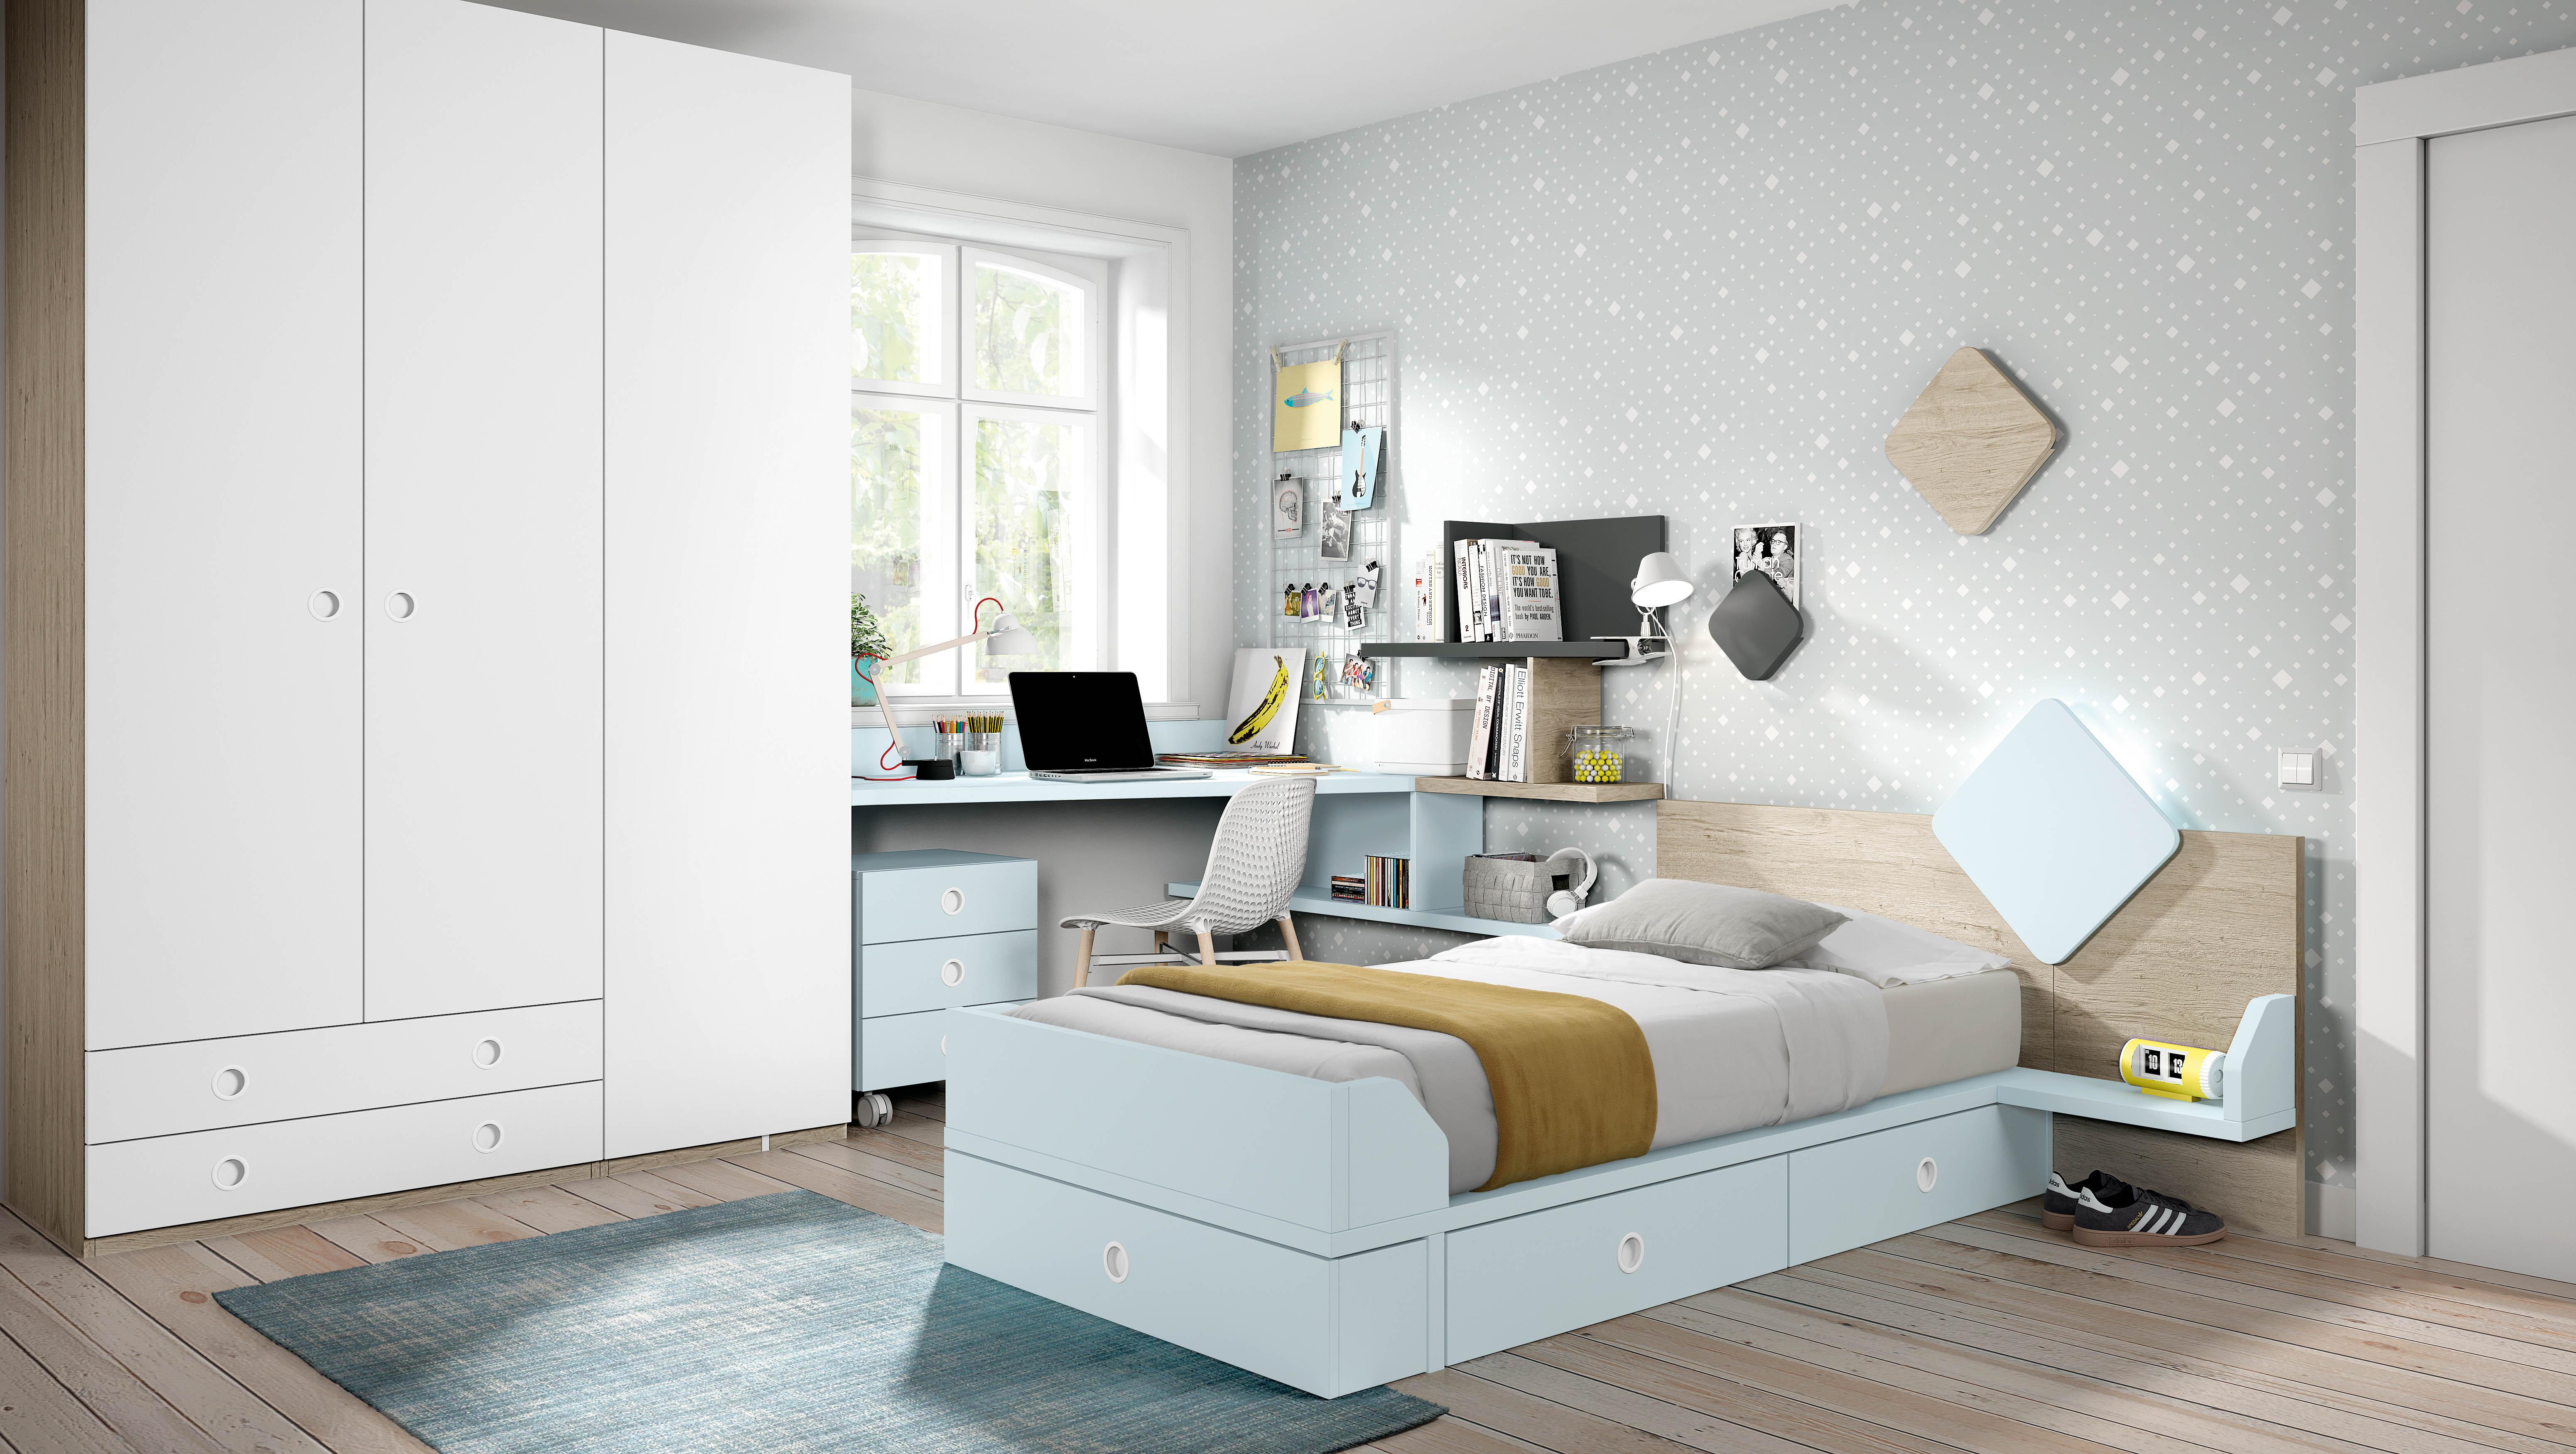 Muebles juveniles camas individuales dormitorios juveniles for Muebles juveniles